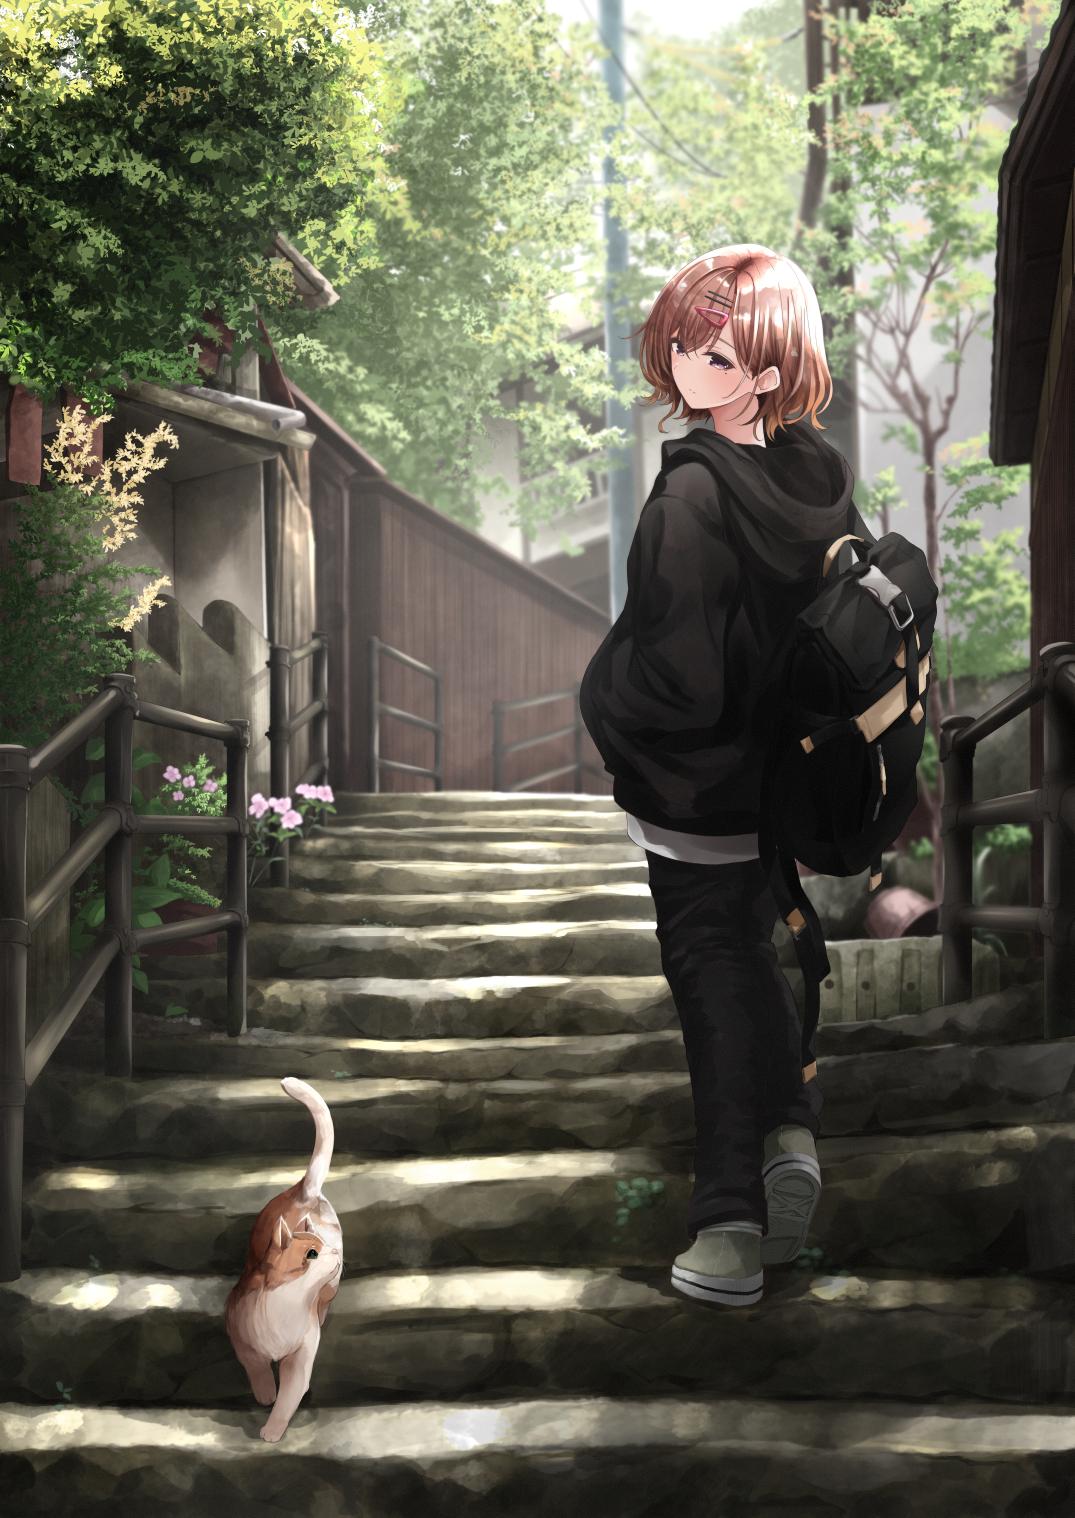 Anime 1075x1518 anime anime girls digital art artwork 2D portrait display THE iDOLM@STER higuchi madoka Fuu (artist) cats short hair brunette